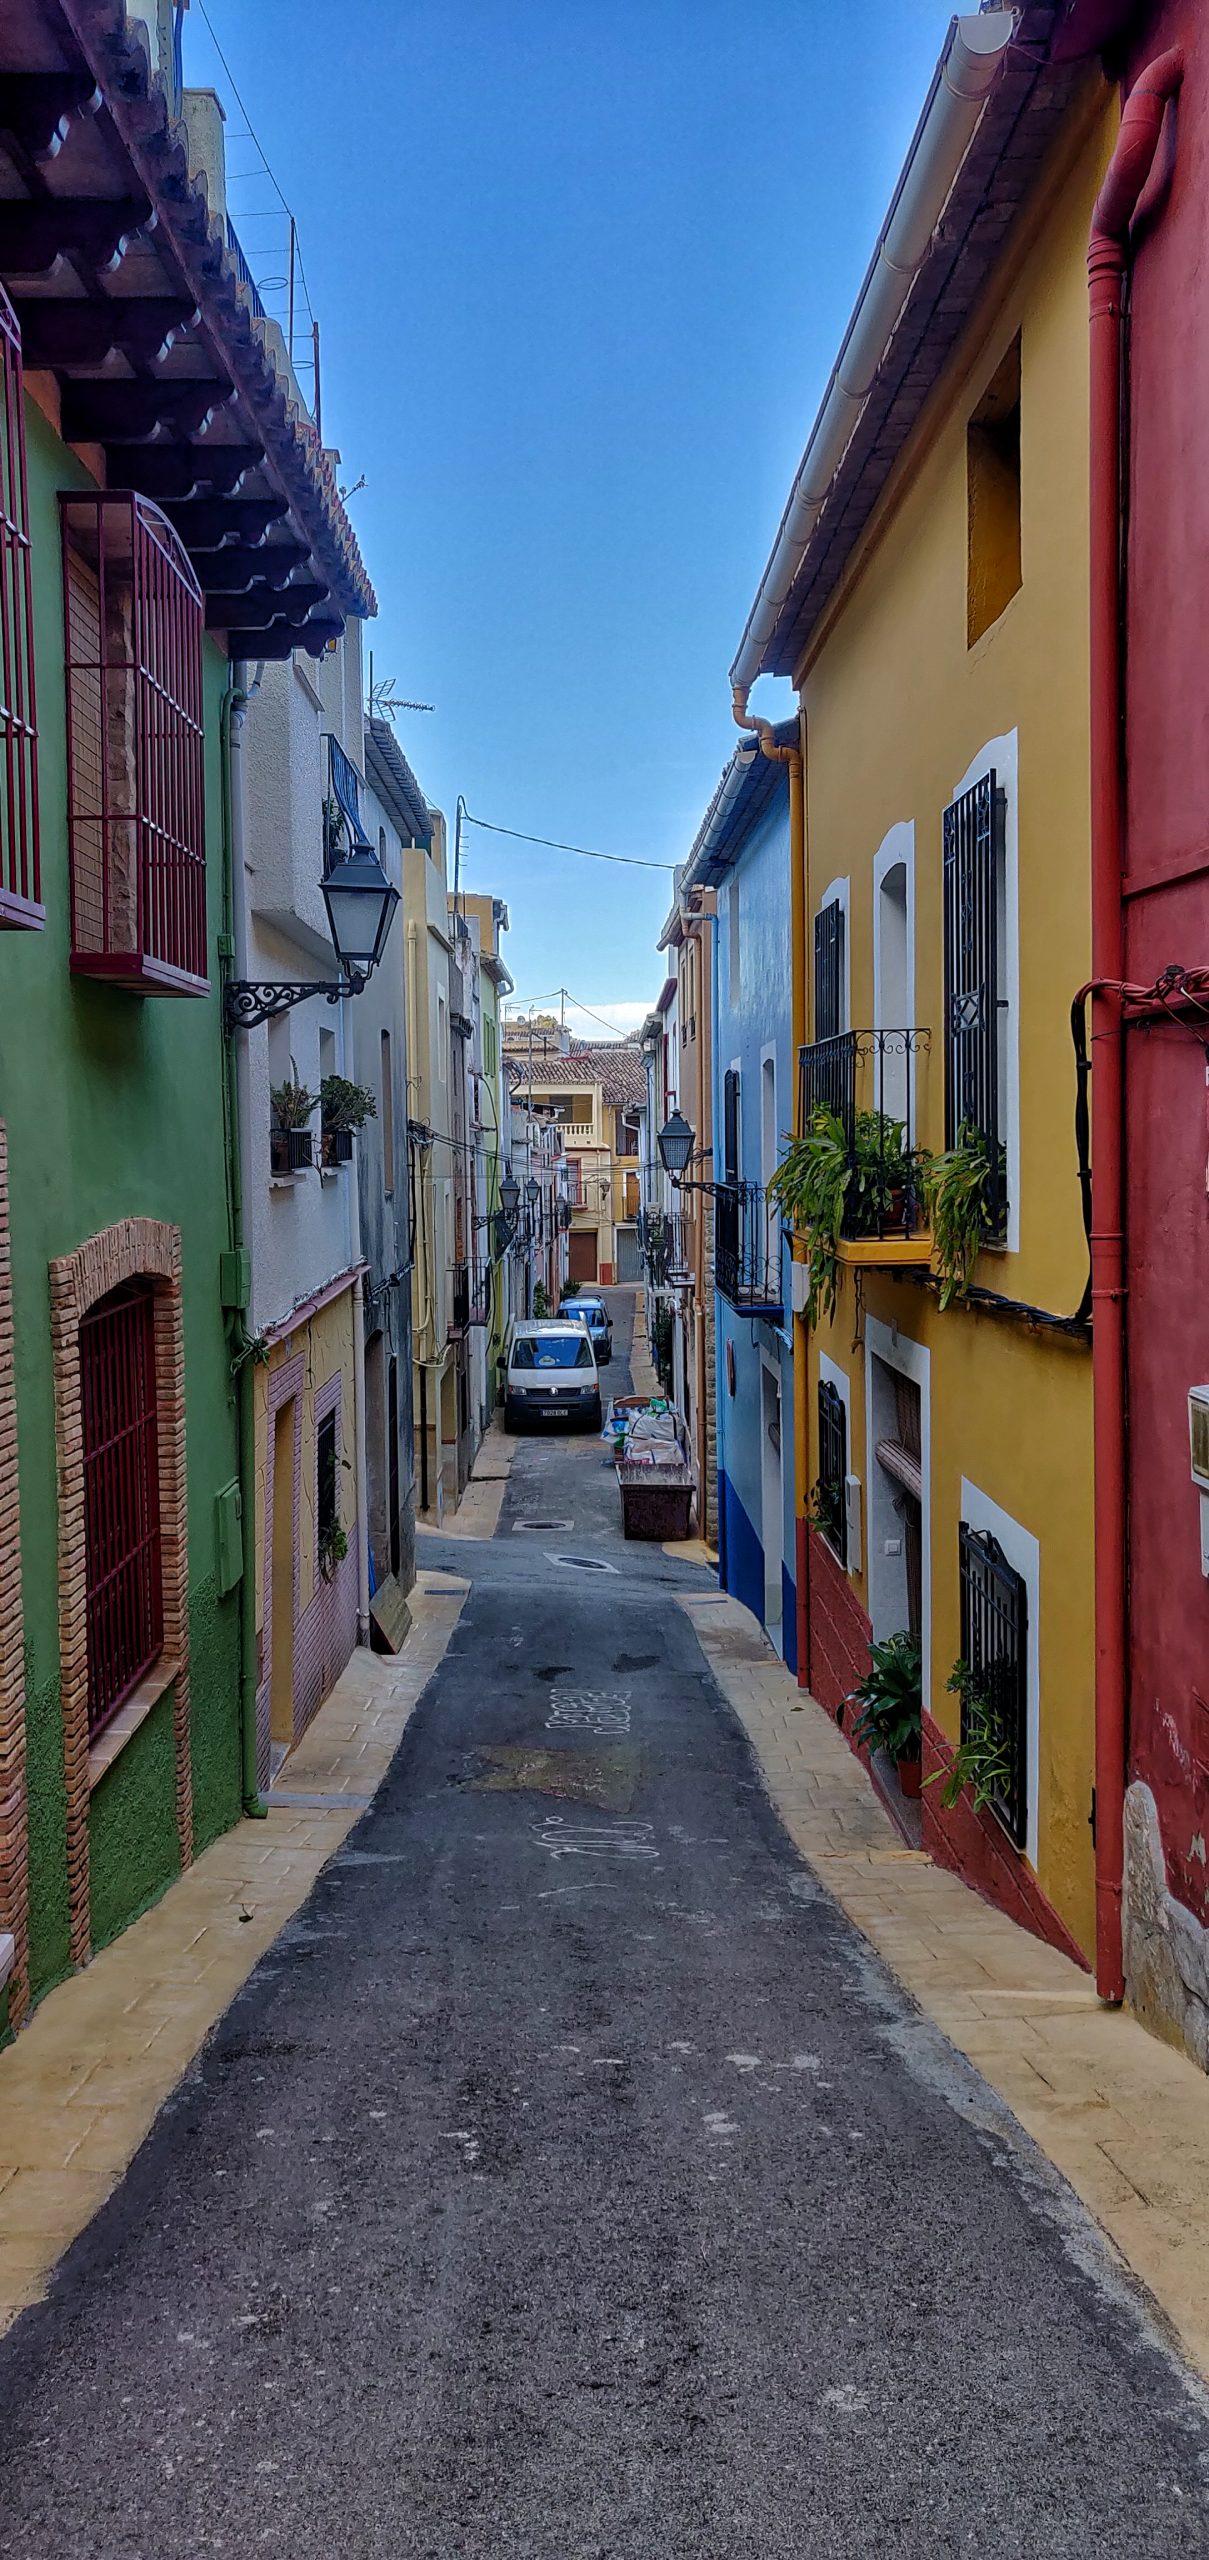 Spainish streets